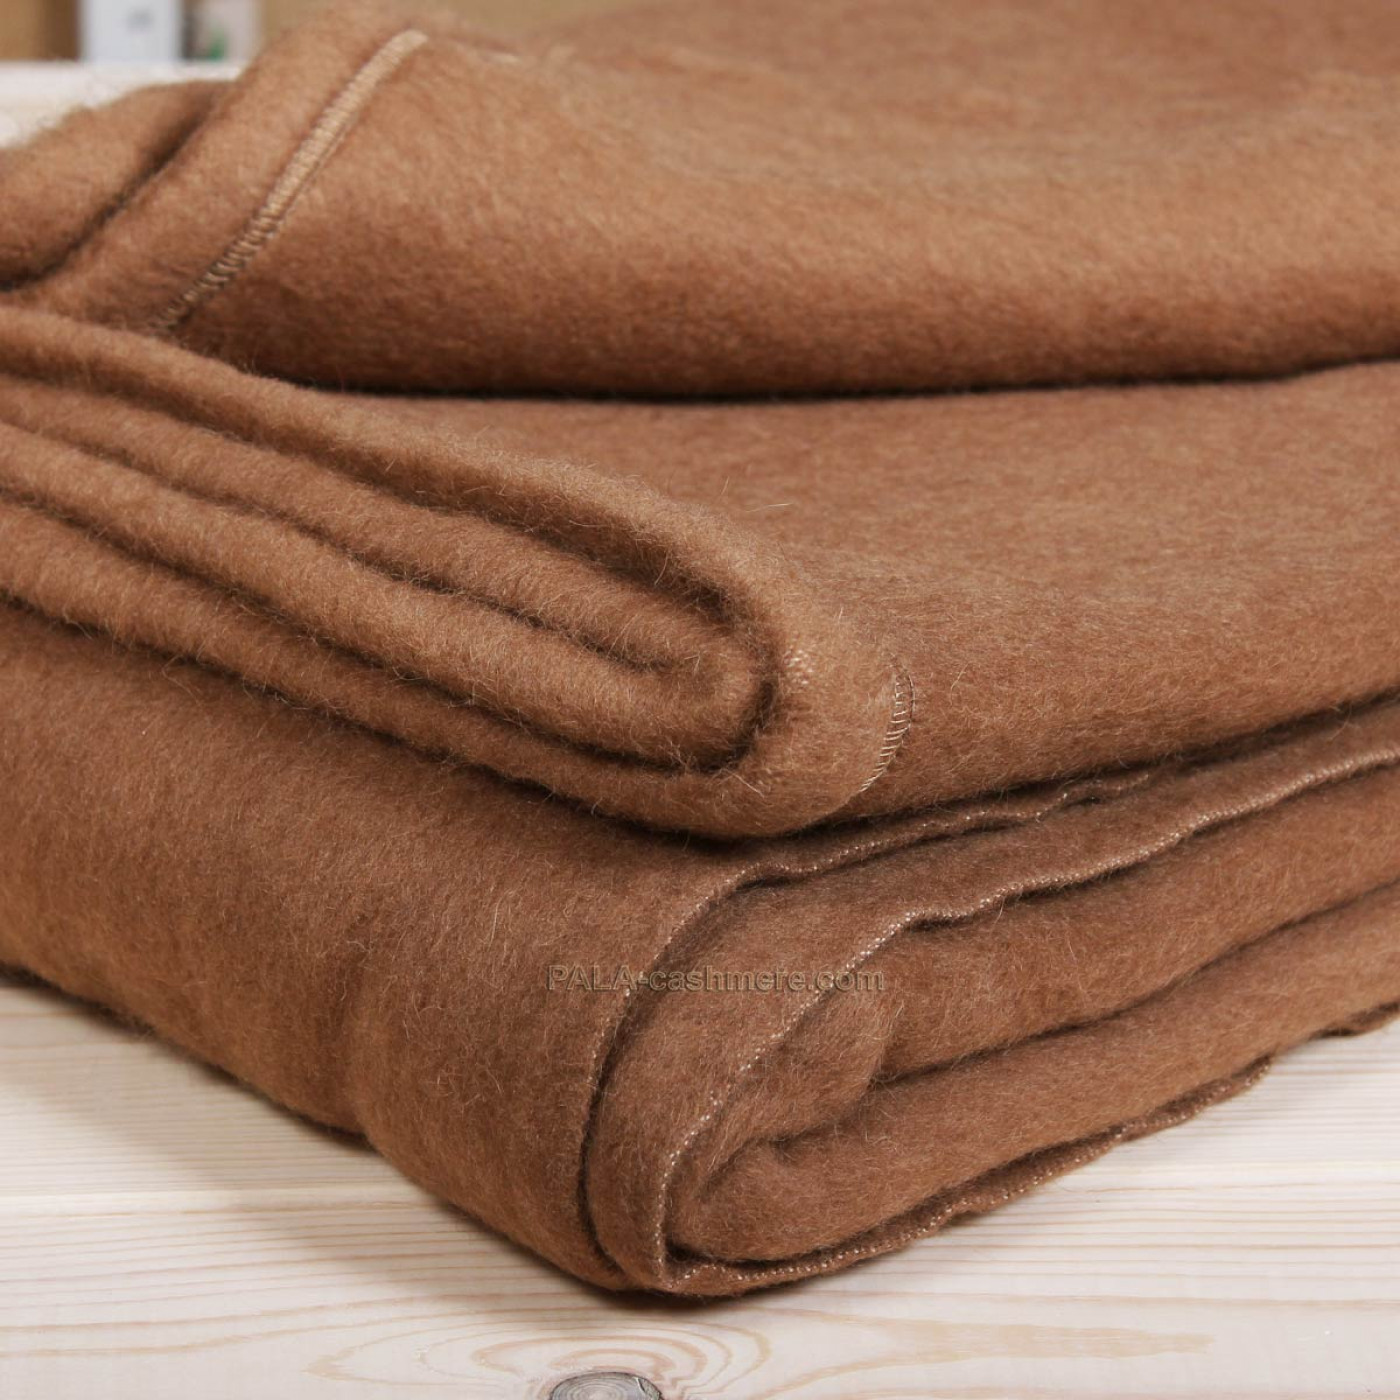 Одеяло из верблюжьей шерсти 200х250